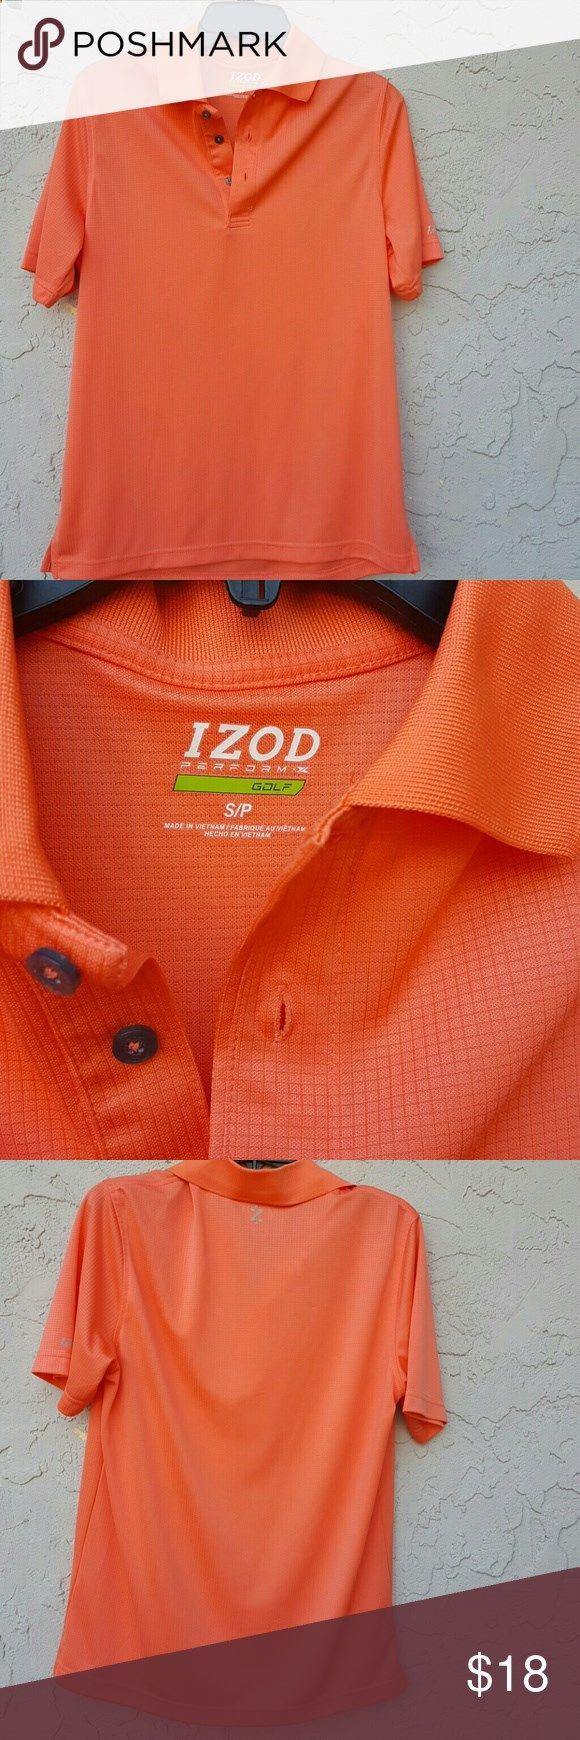 Golf Shirts - IZOD GOLF SHIRT Beautiful color. Izod Shirts Polos